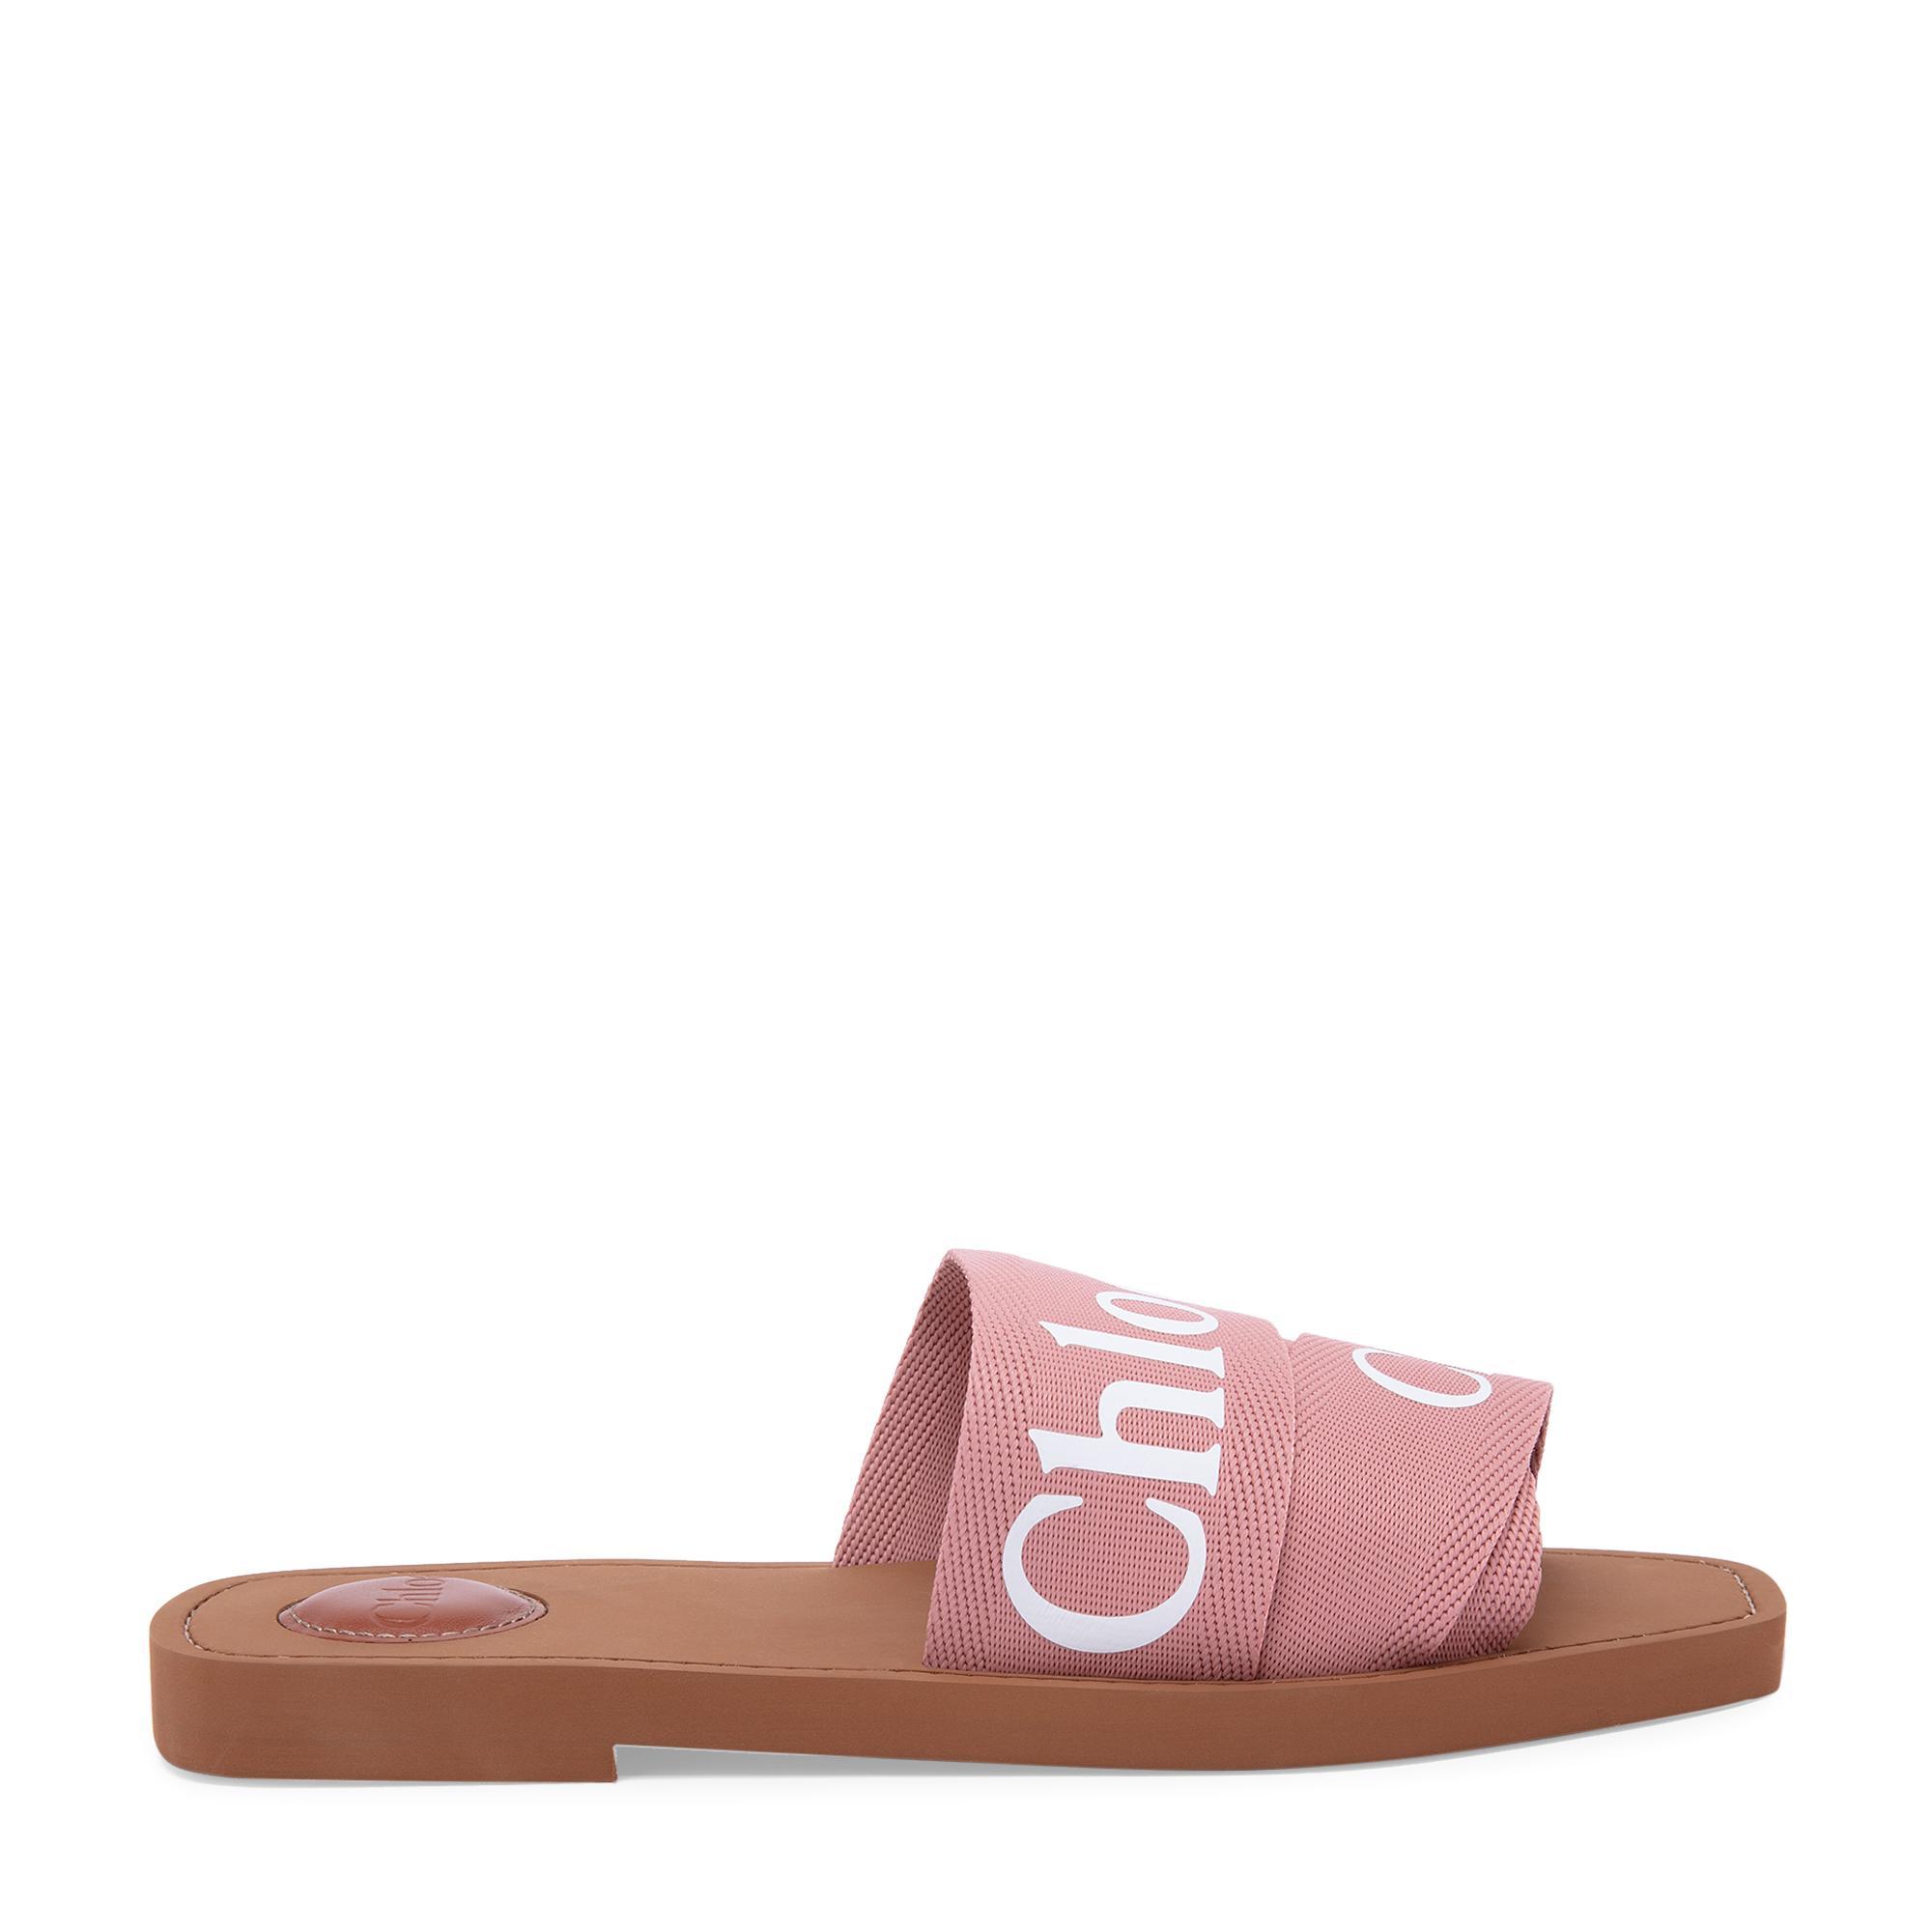 Woody flat sandals